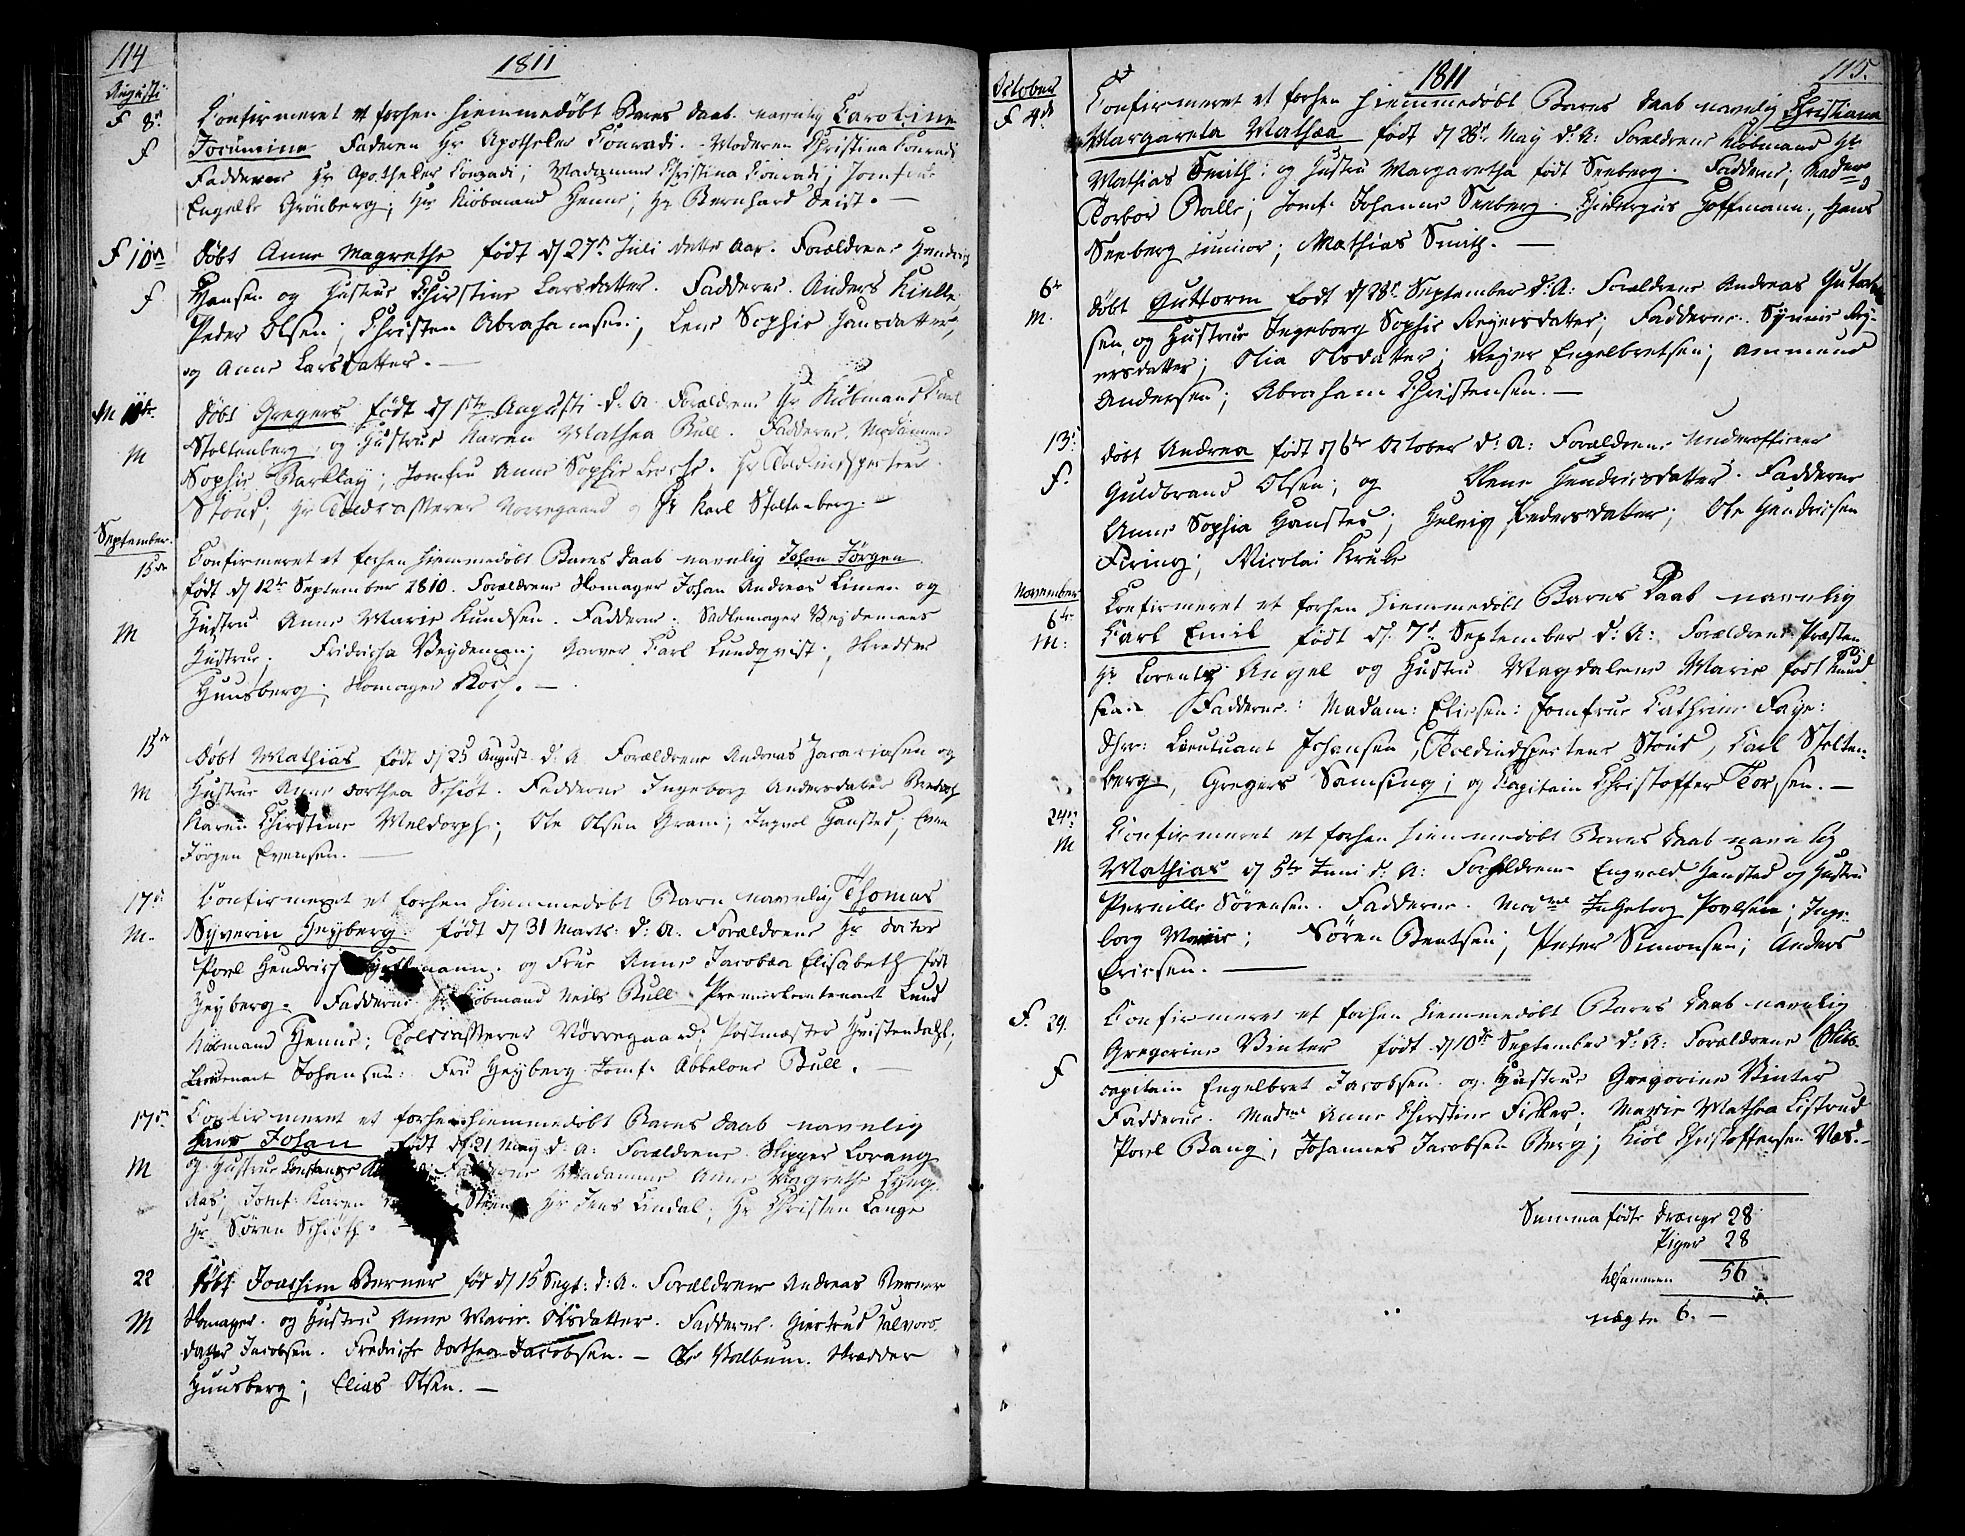 SAKO, Tønsberg kirkebøker, F/Fa/L0003: Ministerialbok nr. I 3, 1797-1814, s. 114-115